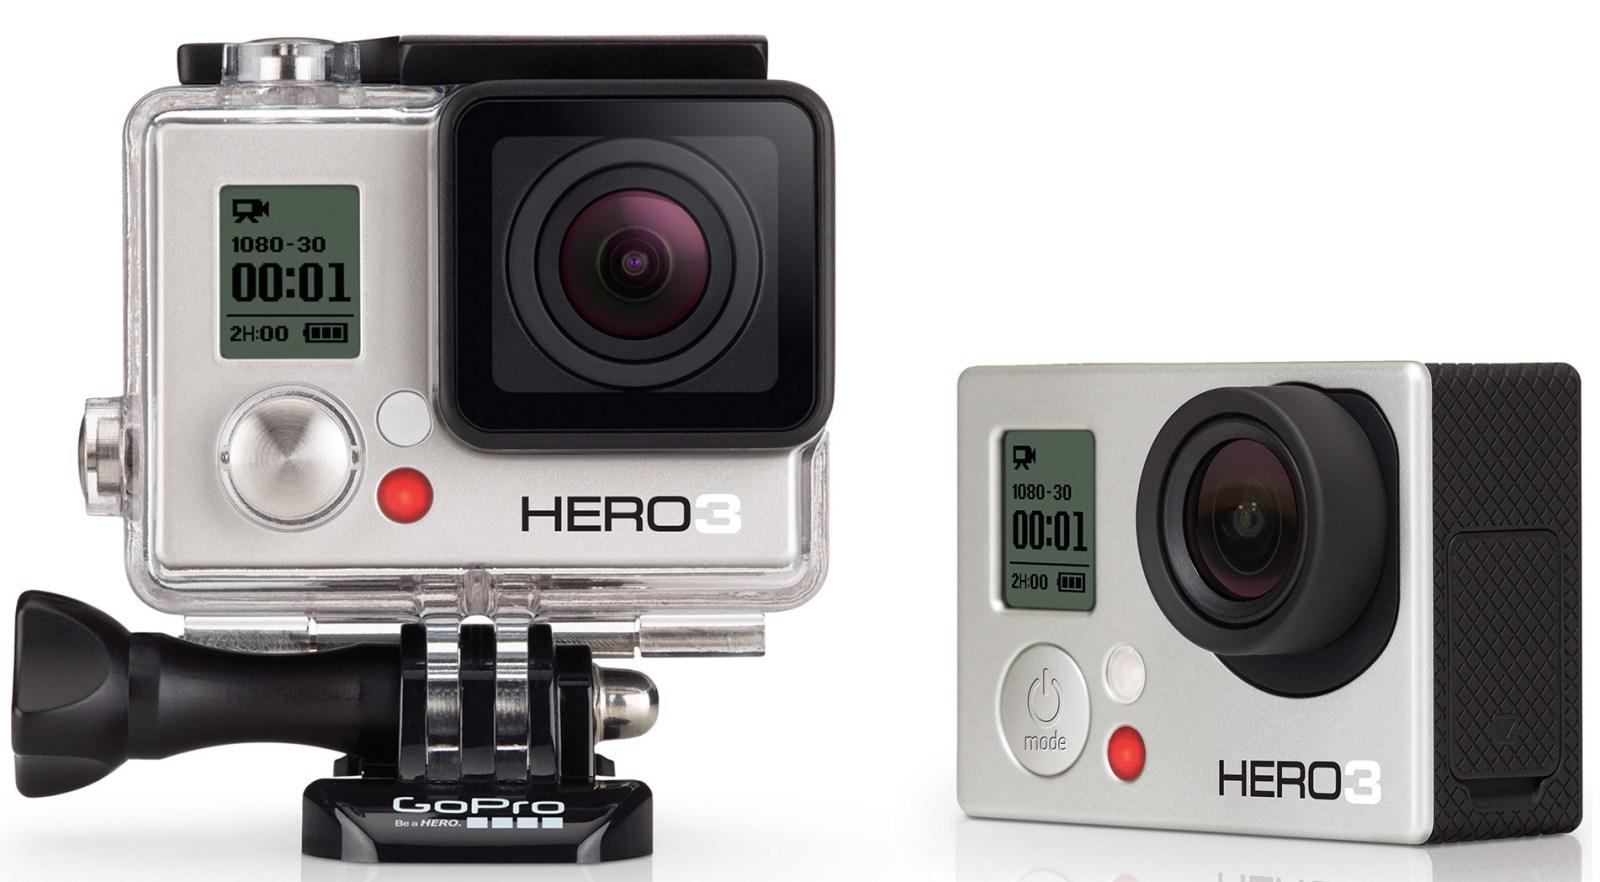 GoPro HERO3 White Edition Action Camera (refurb) $129 shipped (Orig. $200)